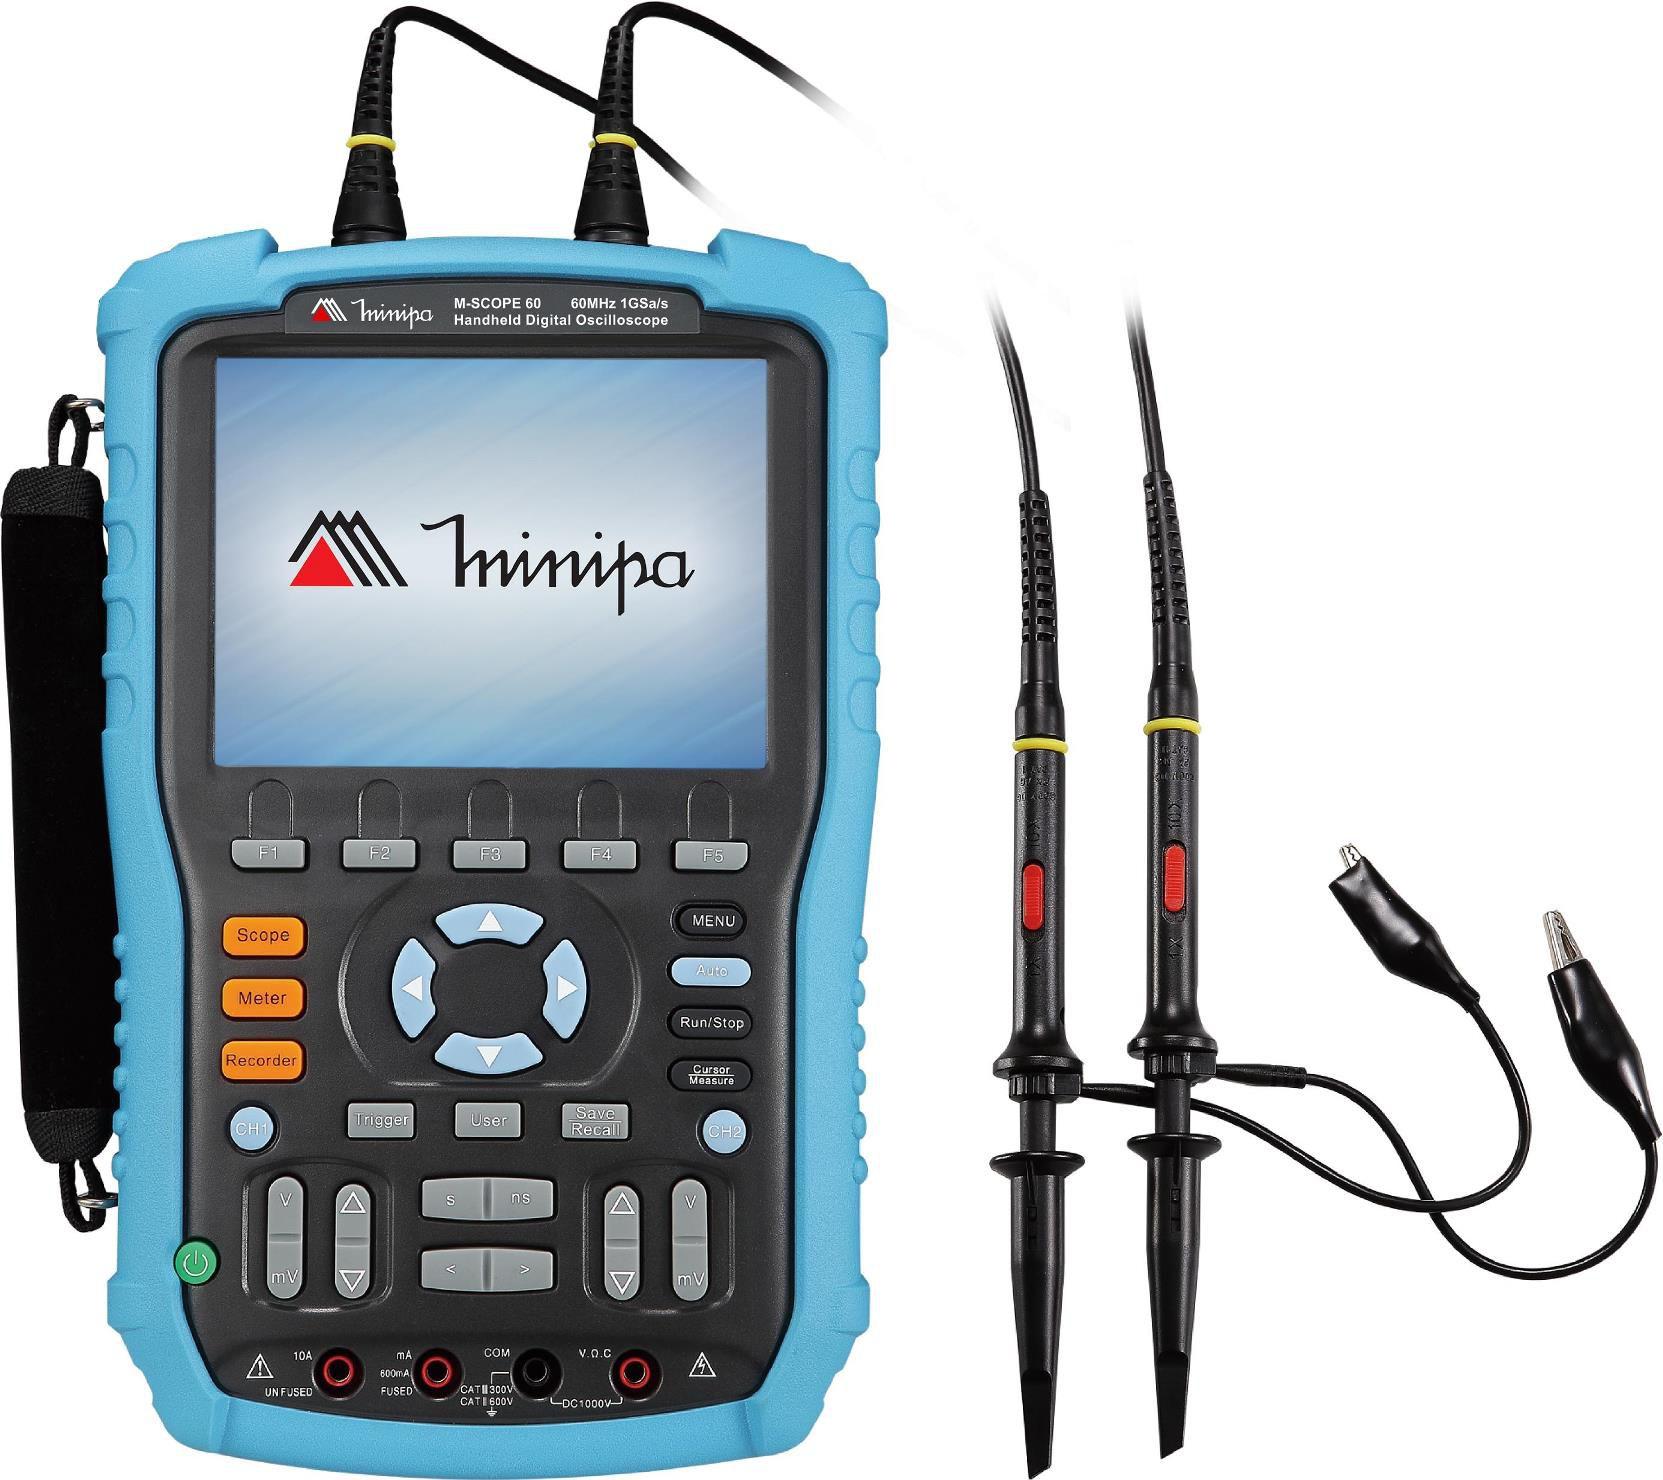 Osciloscópio / Multímetro Portátil 60MHz-2c-1GS/s-CAT III-USB- Minipa - MSCOPE-60  - MRE Ferramentas